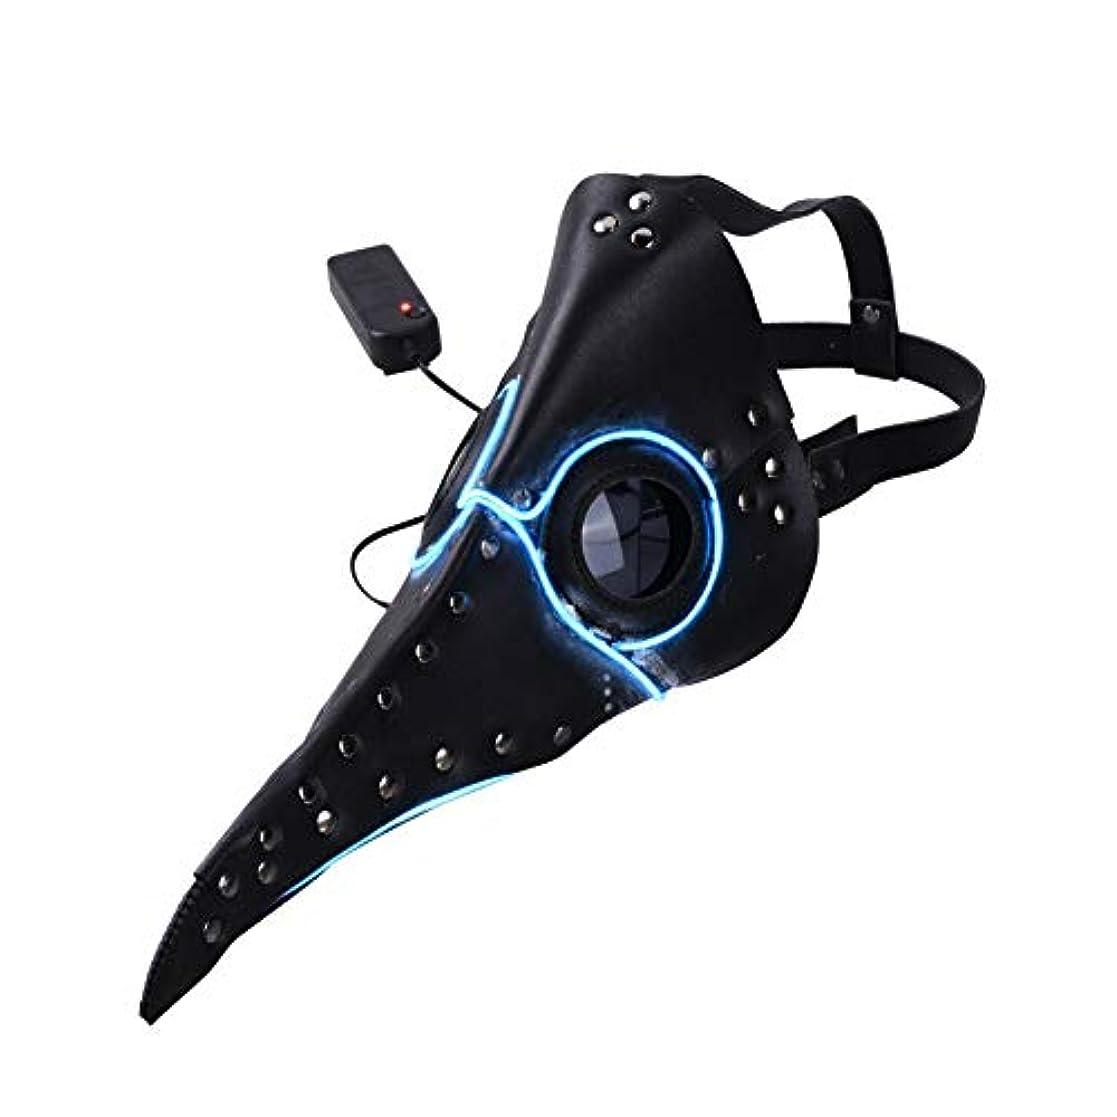 Esolom LEDが点灯 ペストドクターマスク ロングノーズマスク くちばし ハロウィンデコレーション ゴシックロールプレイング カーニバル衣装小道具